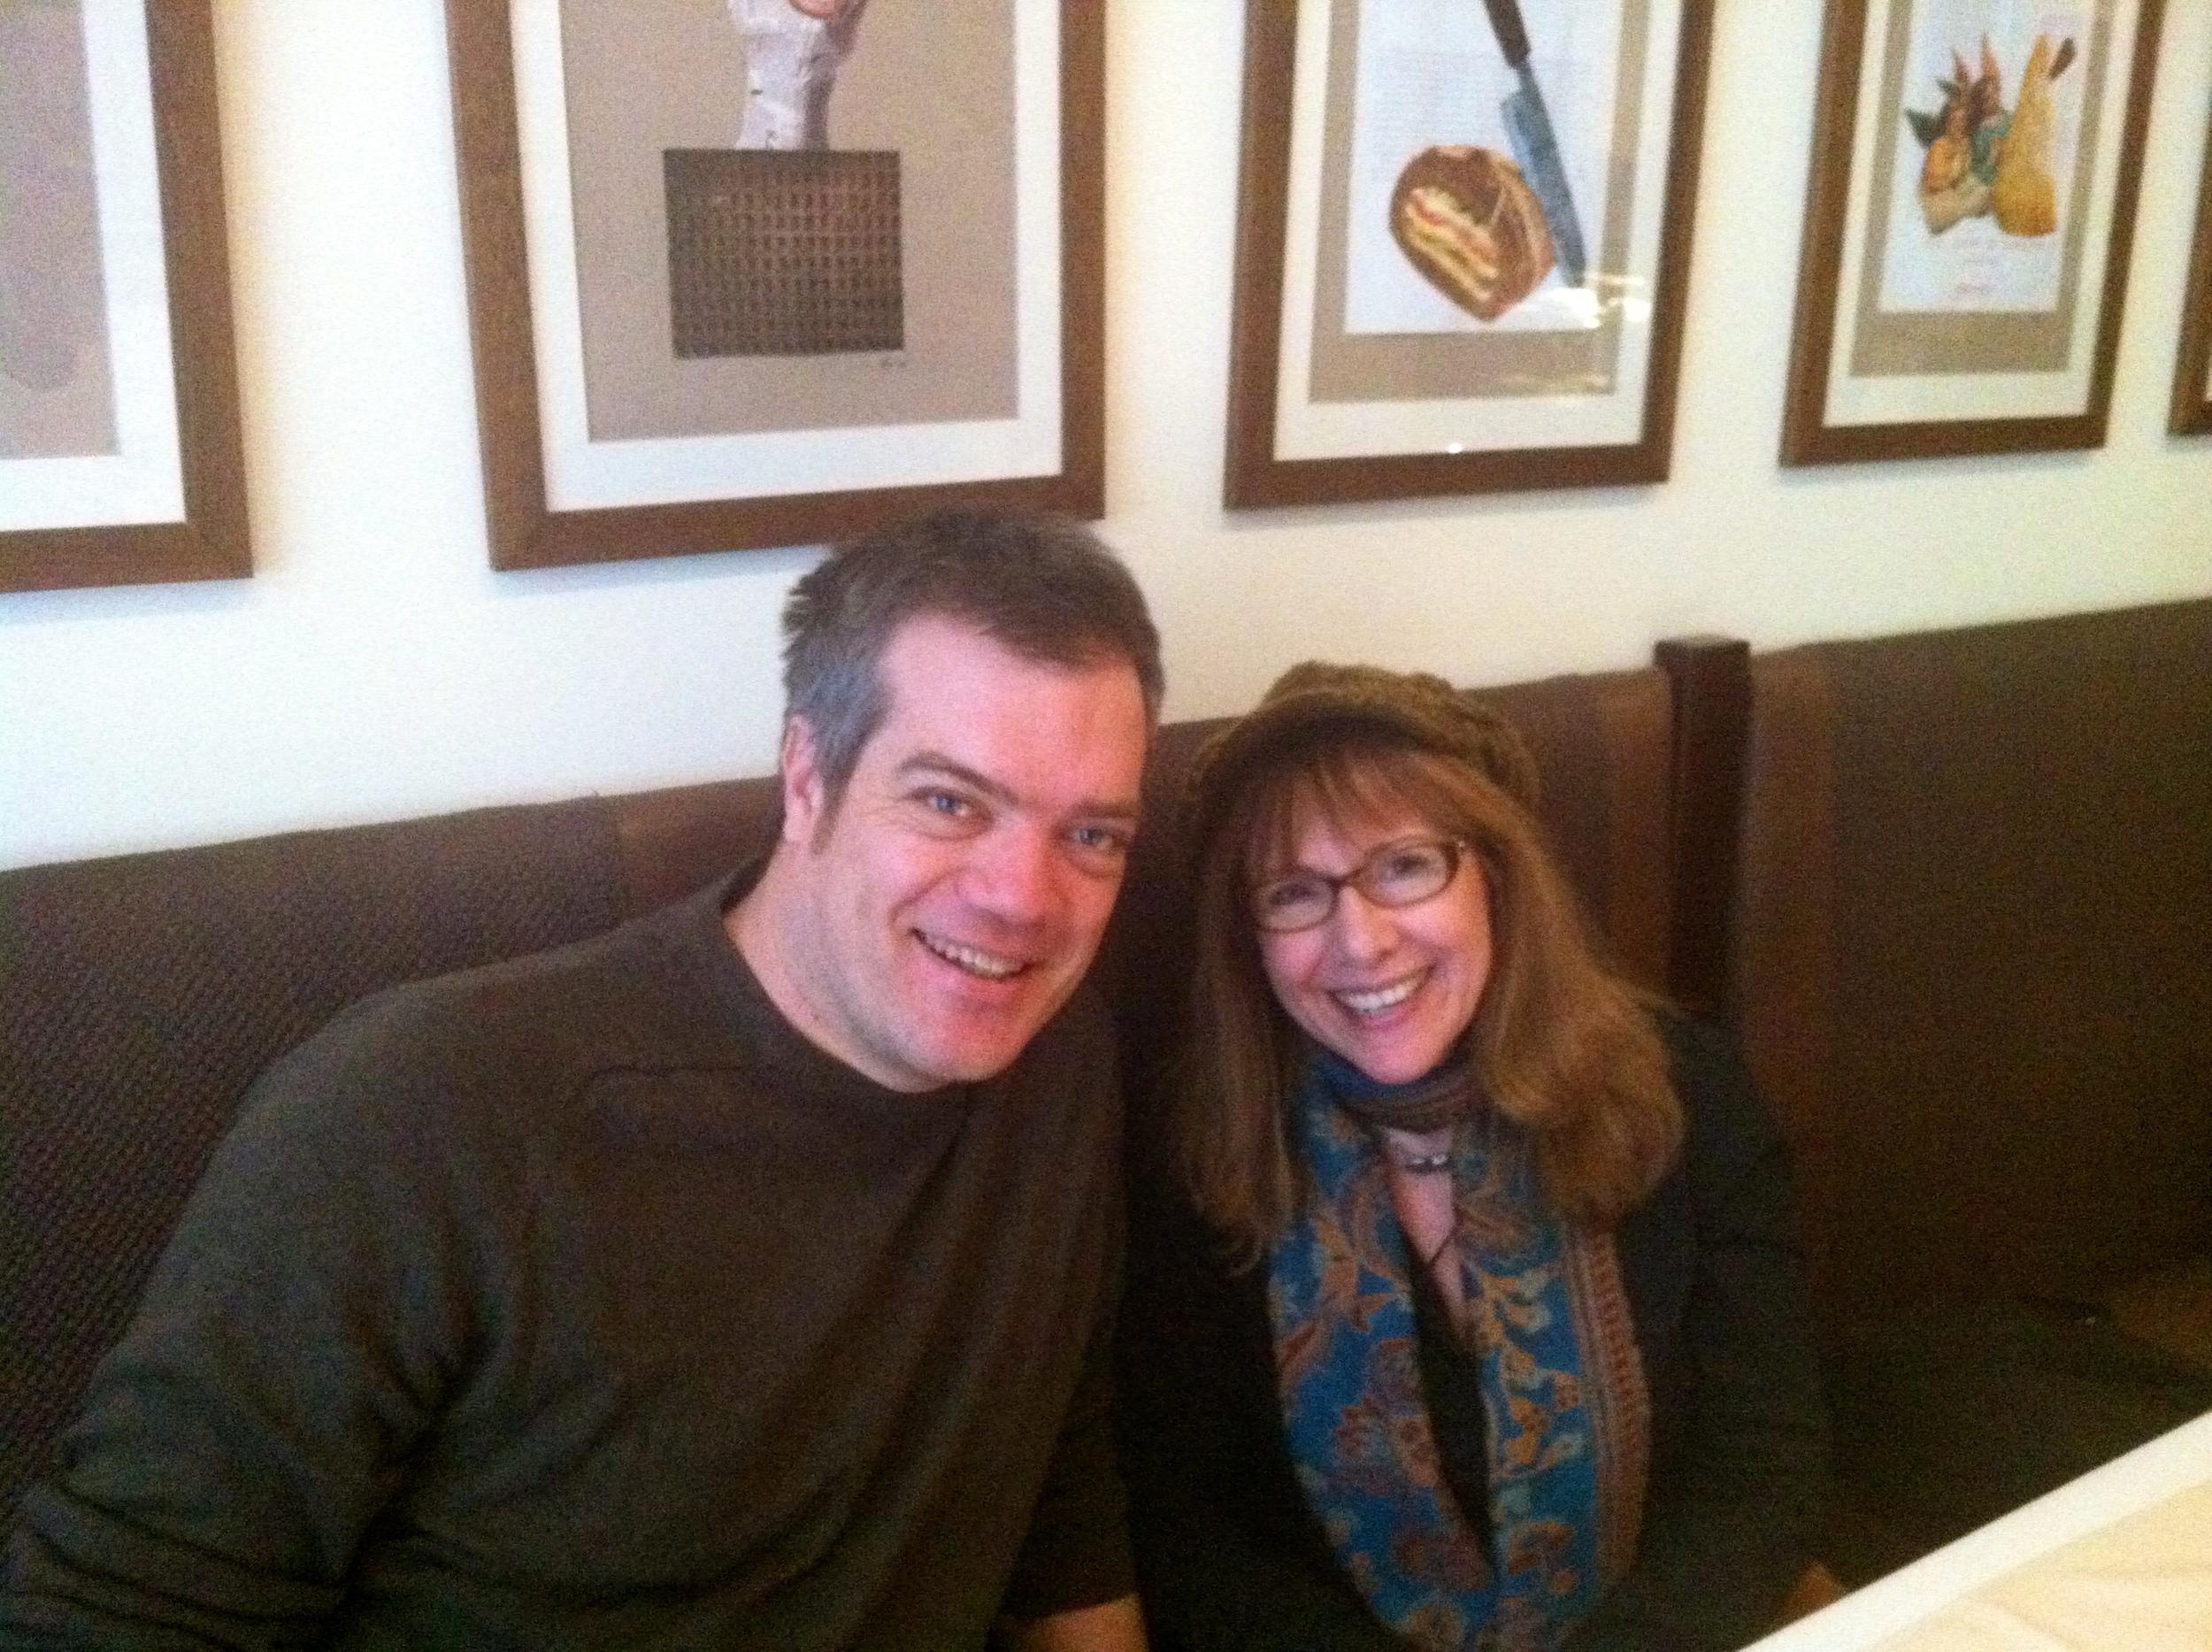 Vanda and I ran into cousin / artist Mihail Milunović at the Pane E Vino Restaurant